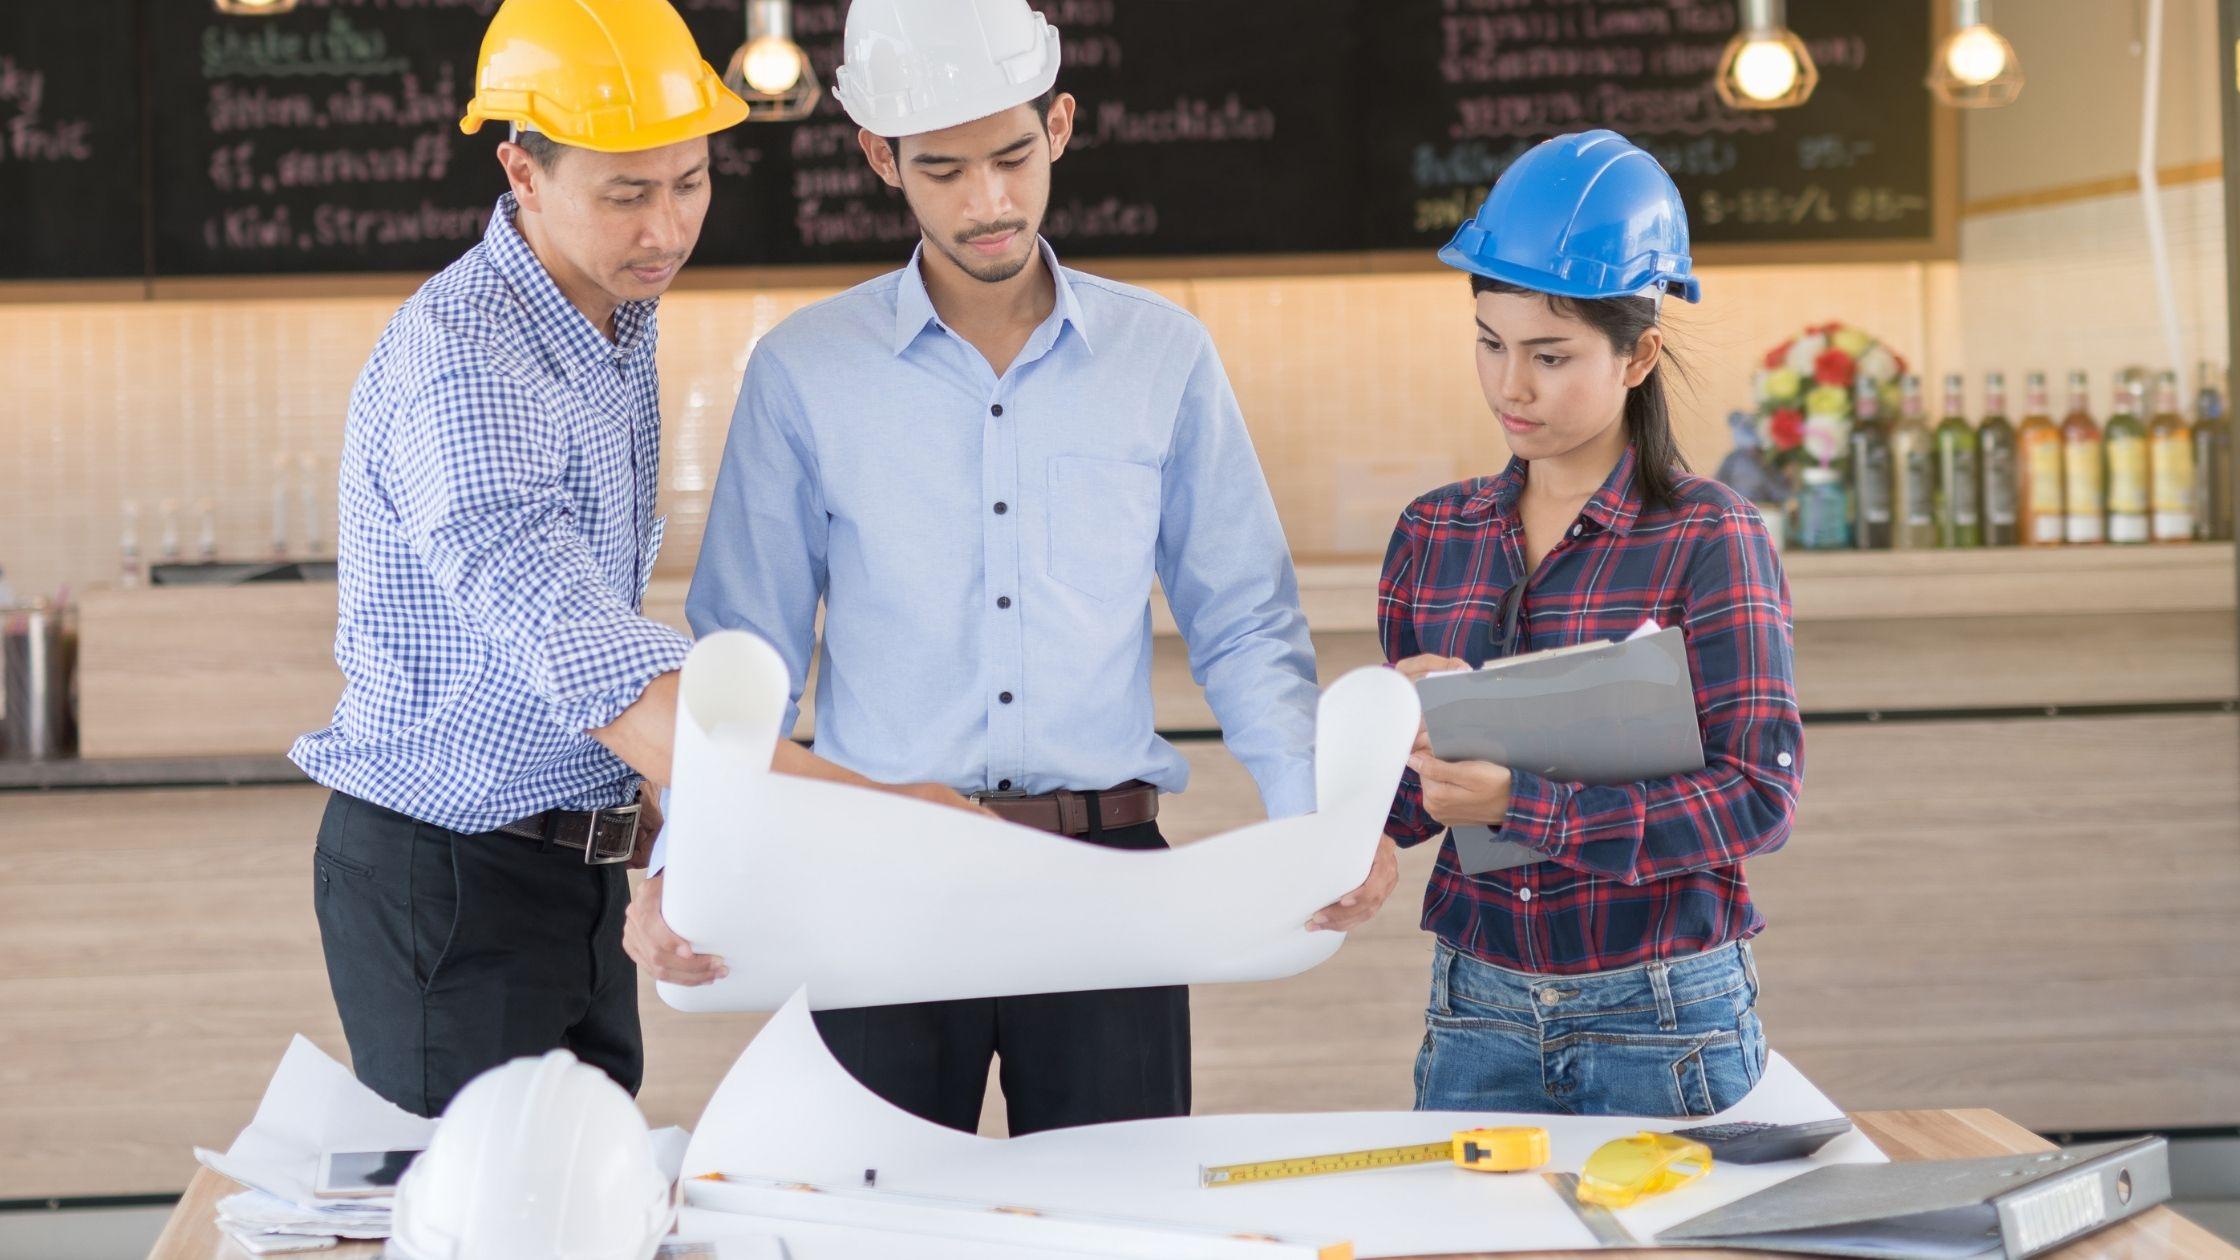 construction miscommunication